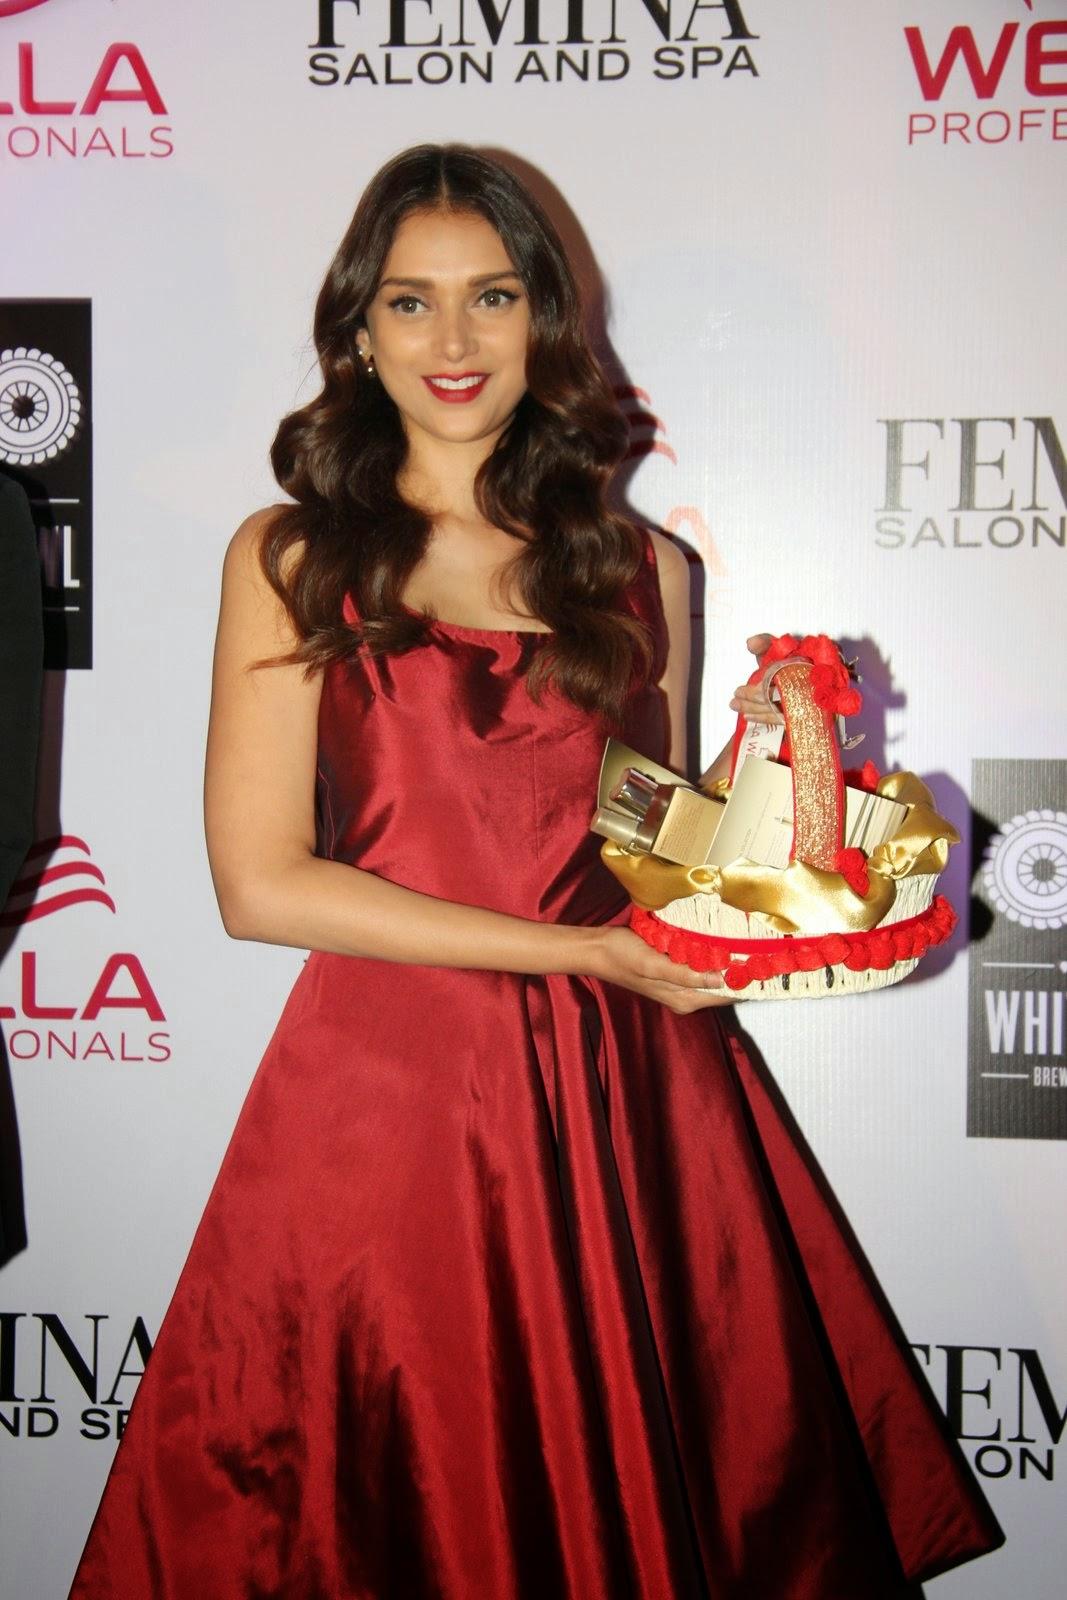 Actress Aditi Rao Hydari Latest Cute Hot Red Dress Spicy Photos Gallery At Femina Salon and Spa Magazine Launch